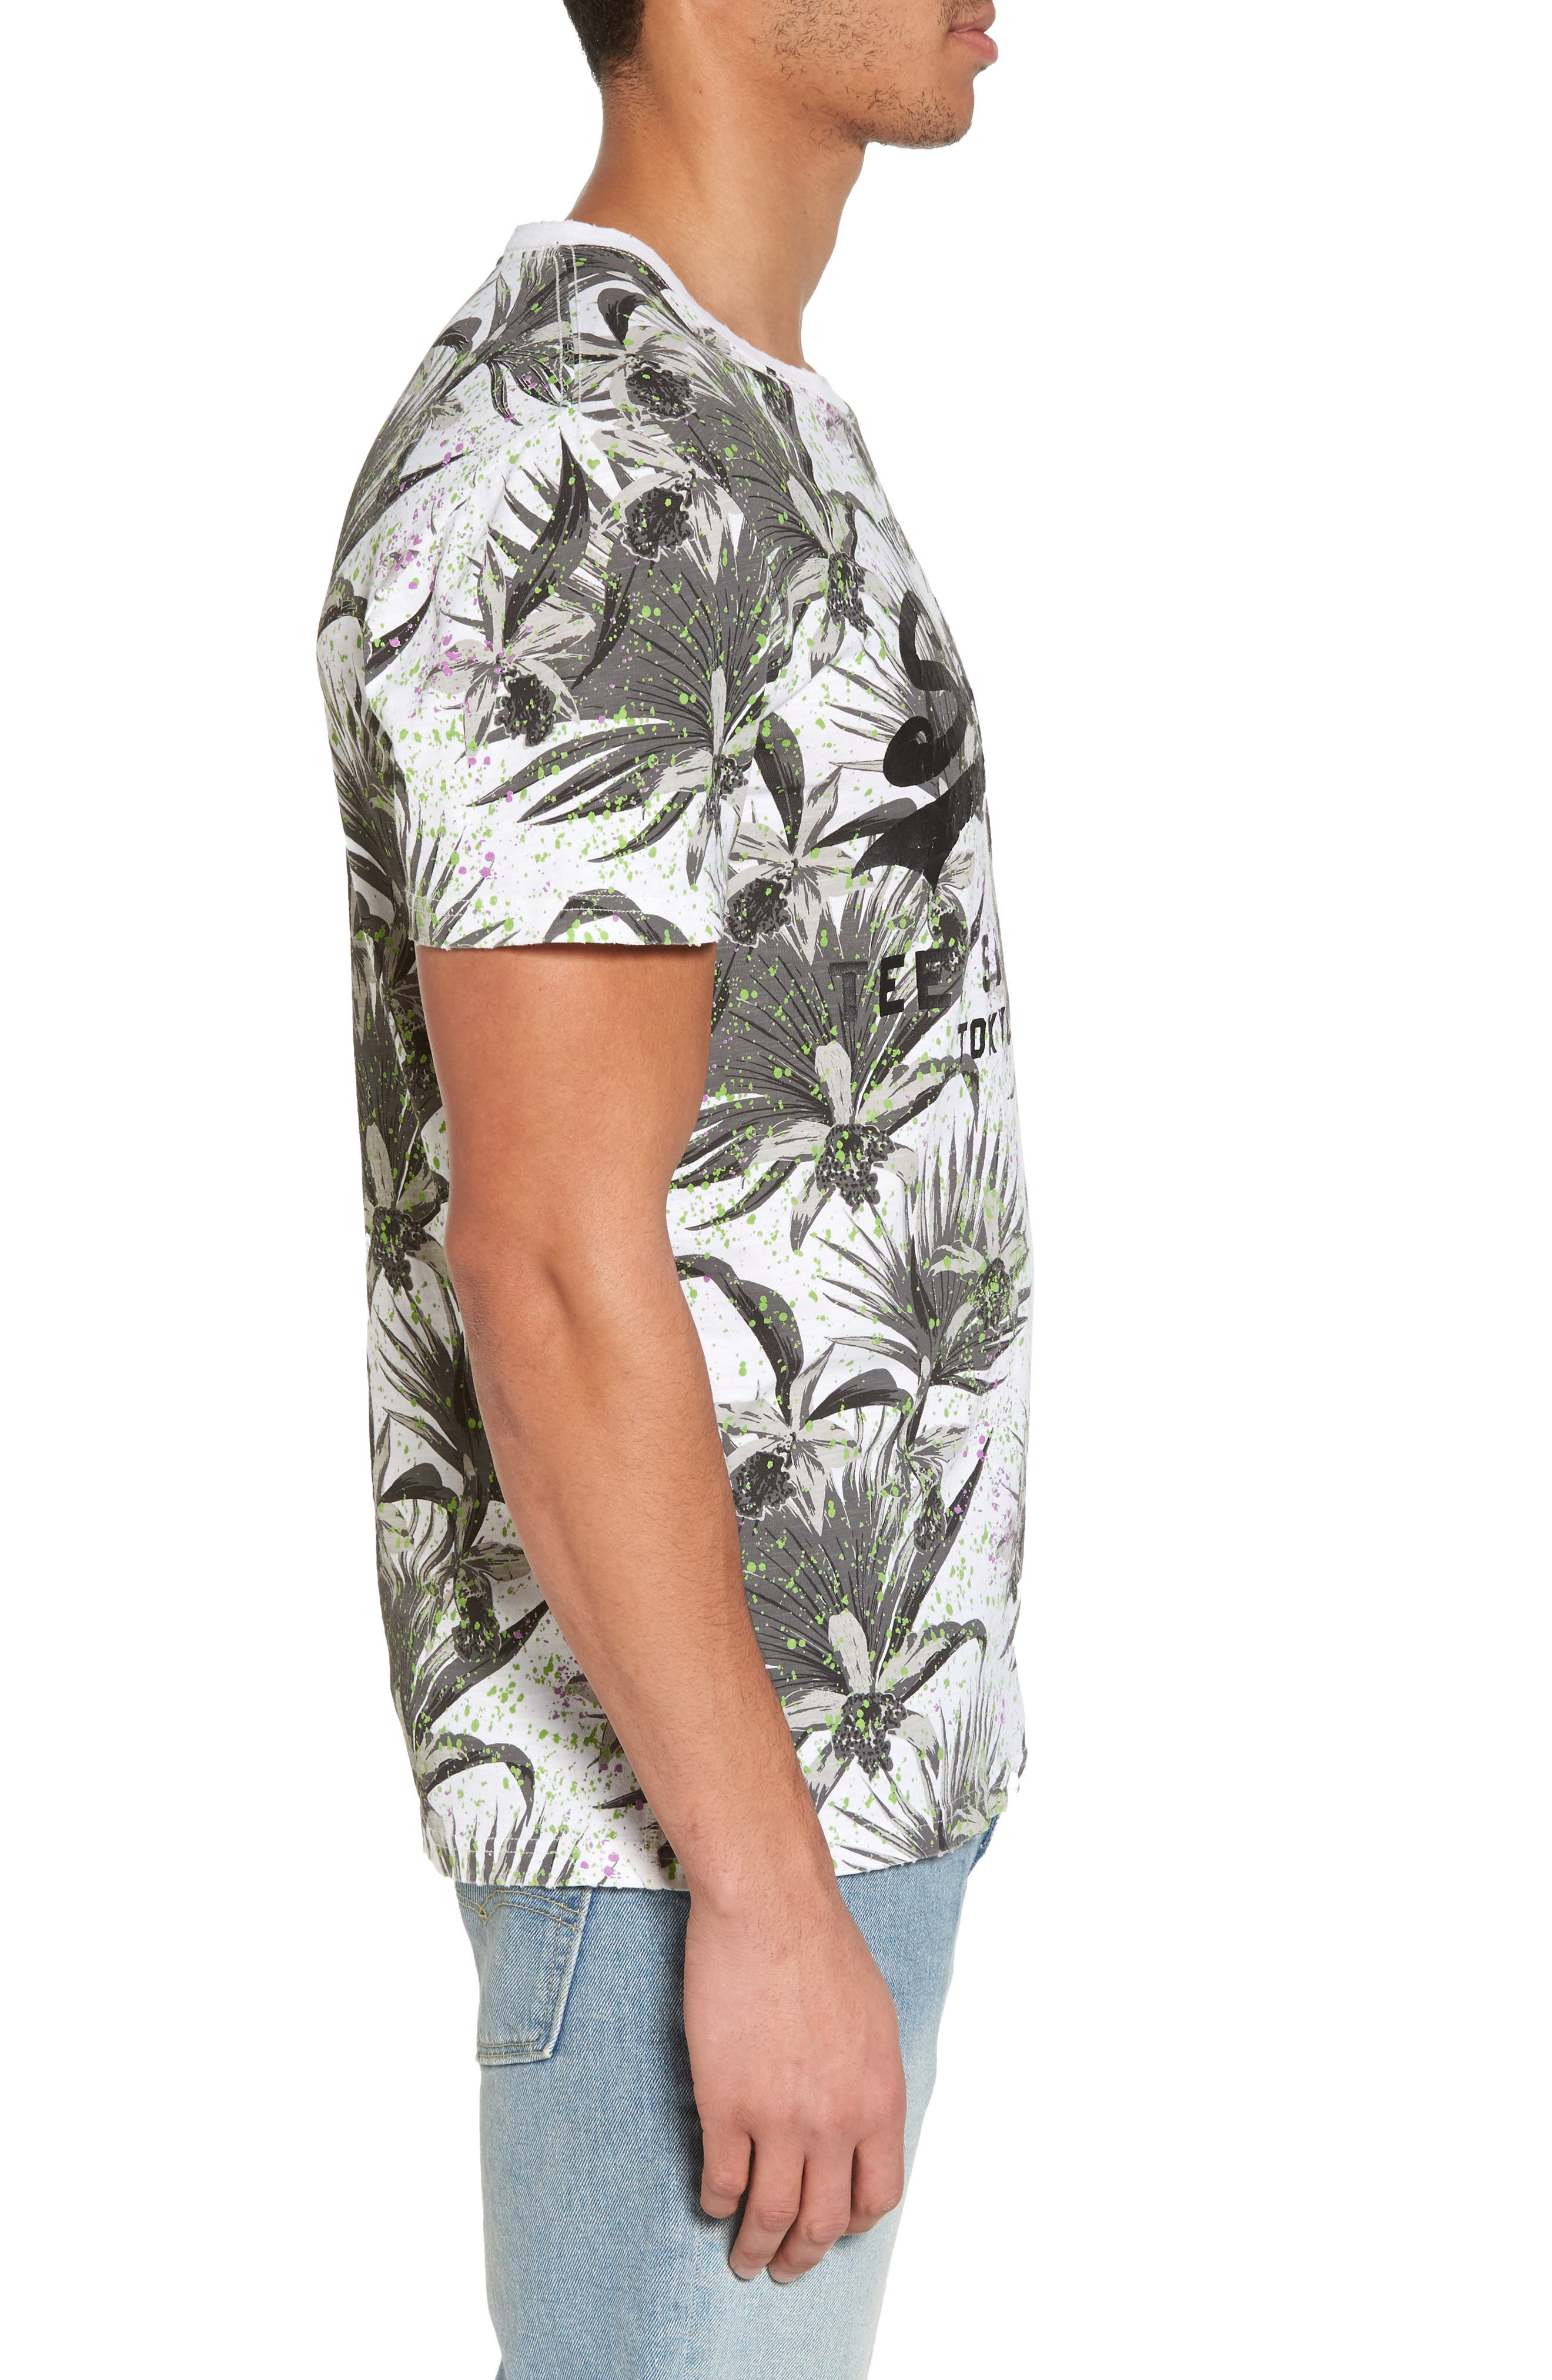 Shirt Shop Aop T-Shirt,                             Alternate thumbnail 3, color,                             OPTIC